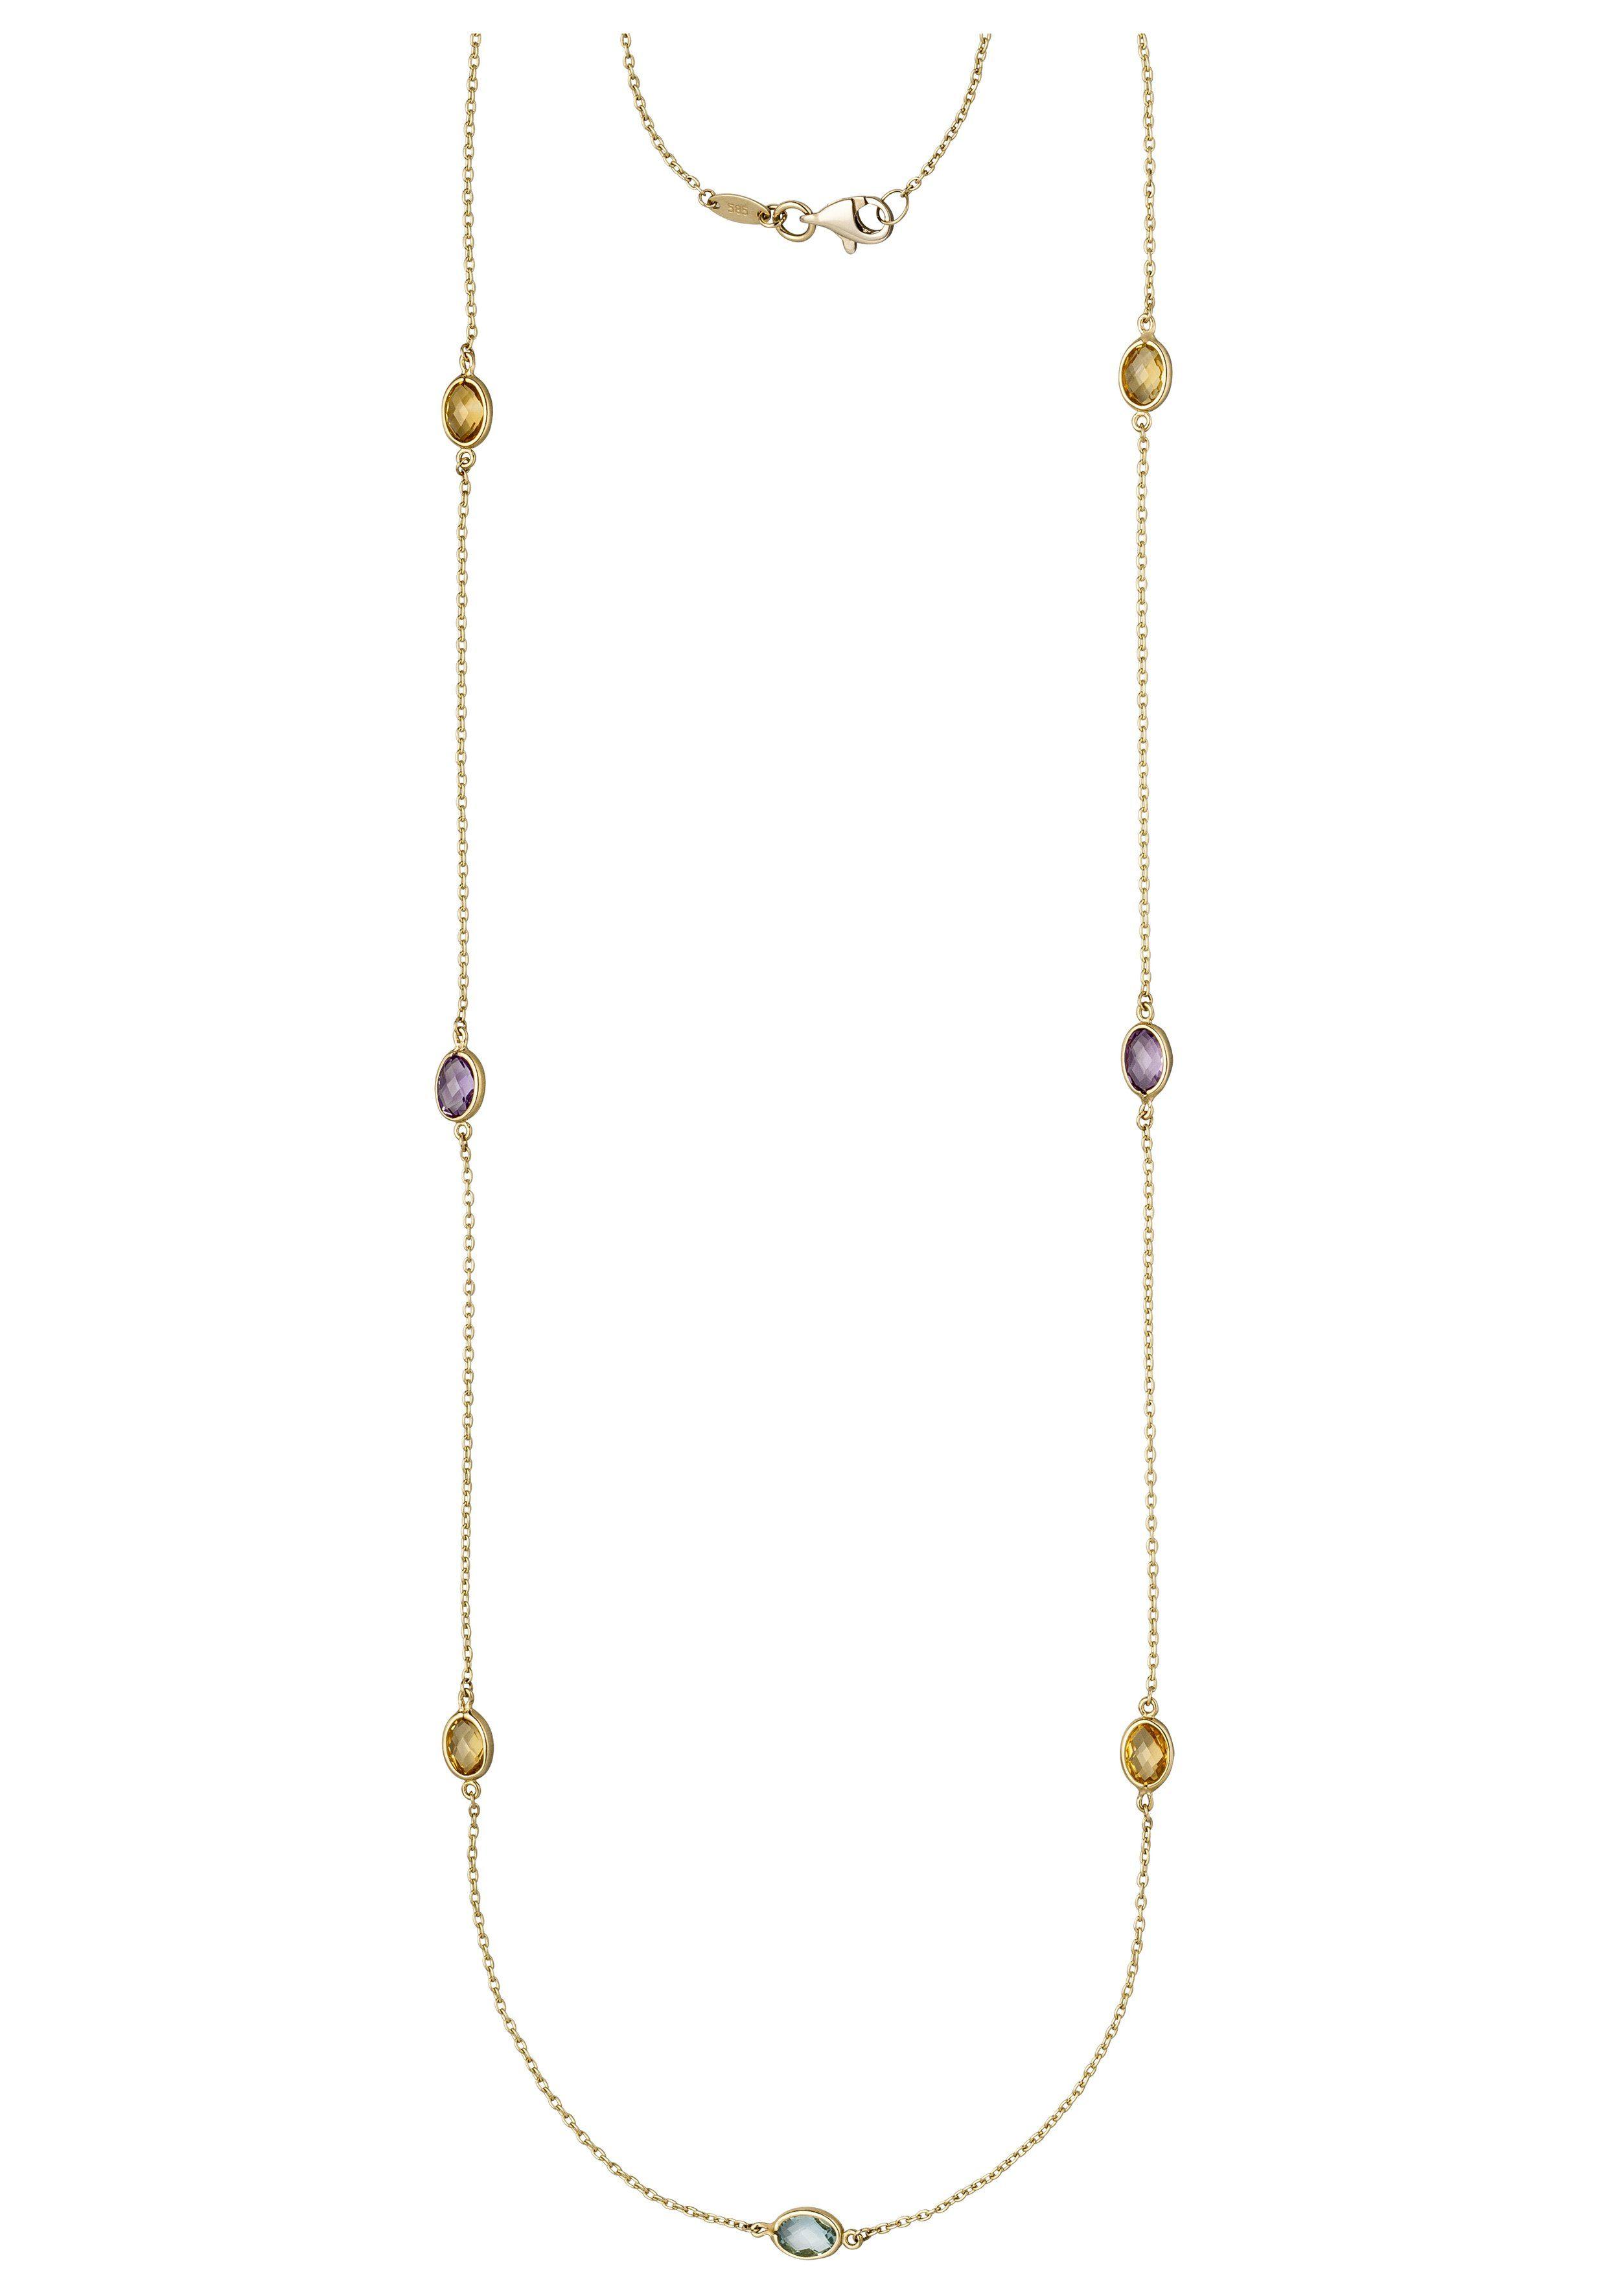 JOBO Collier 585 Gold mit Amethyst Blautopas Citrin 90 cm